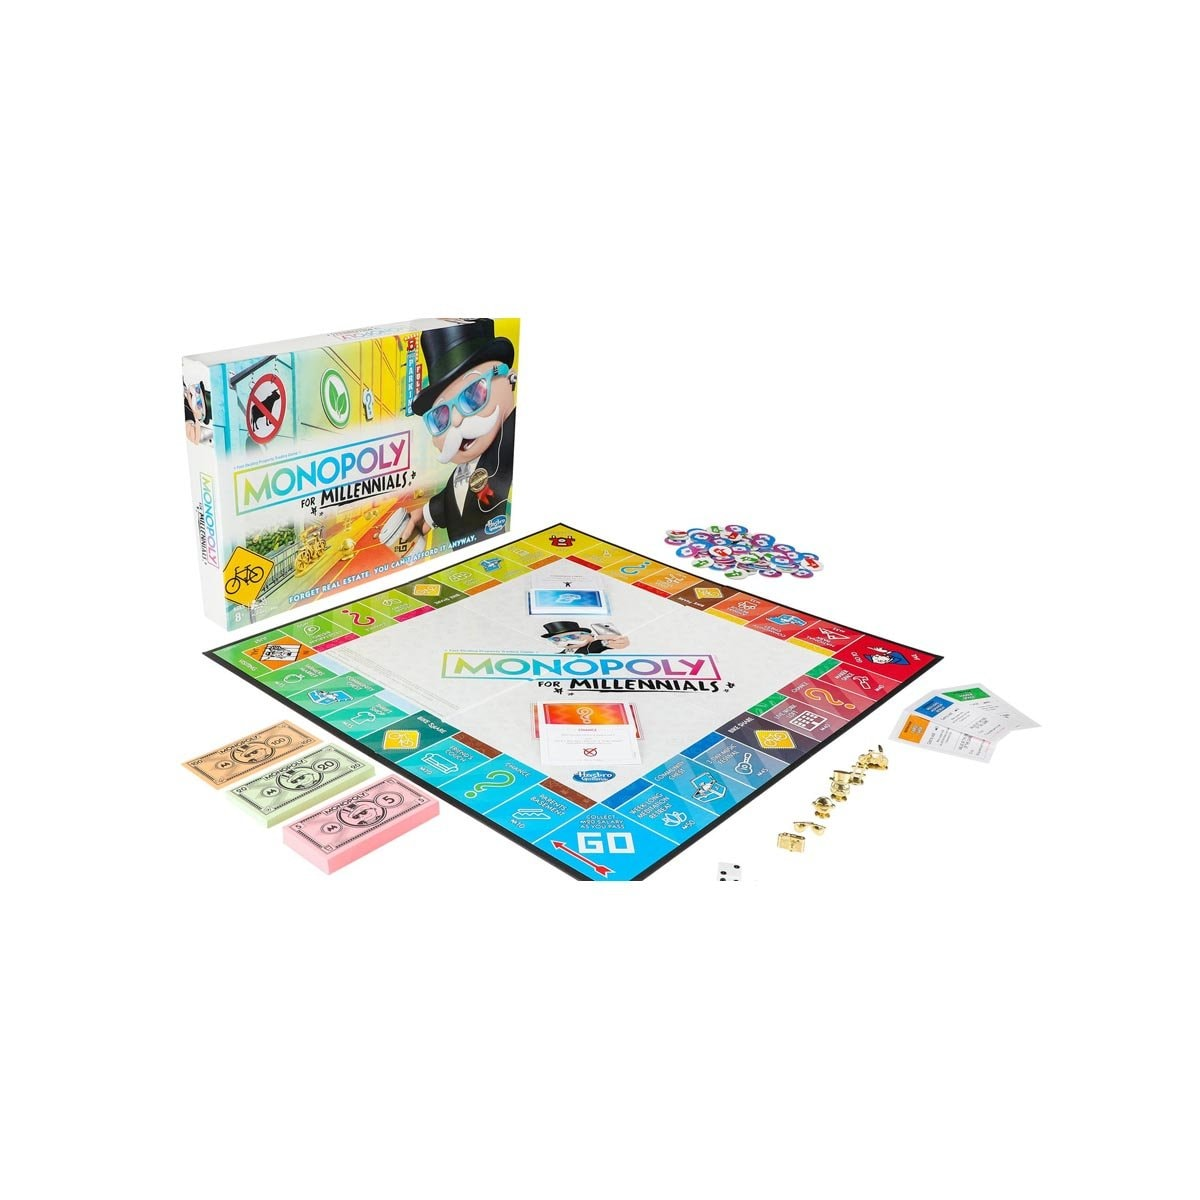 Monopoly Millenial Hasbro